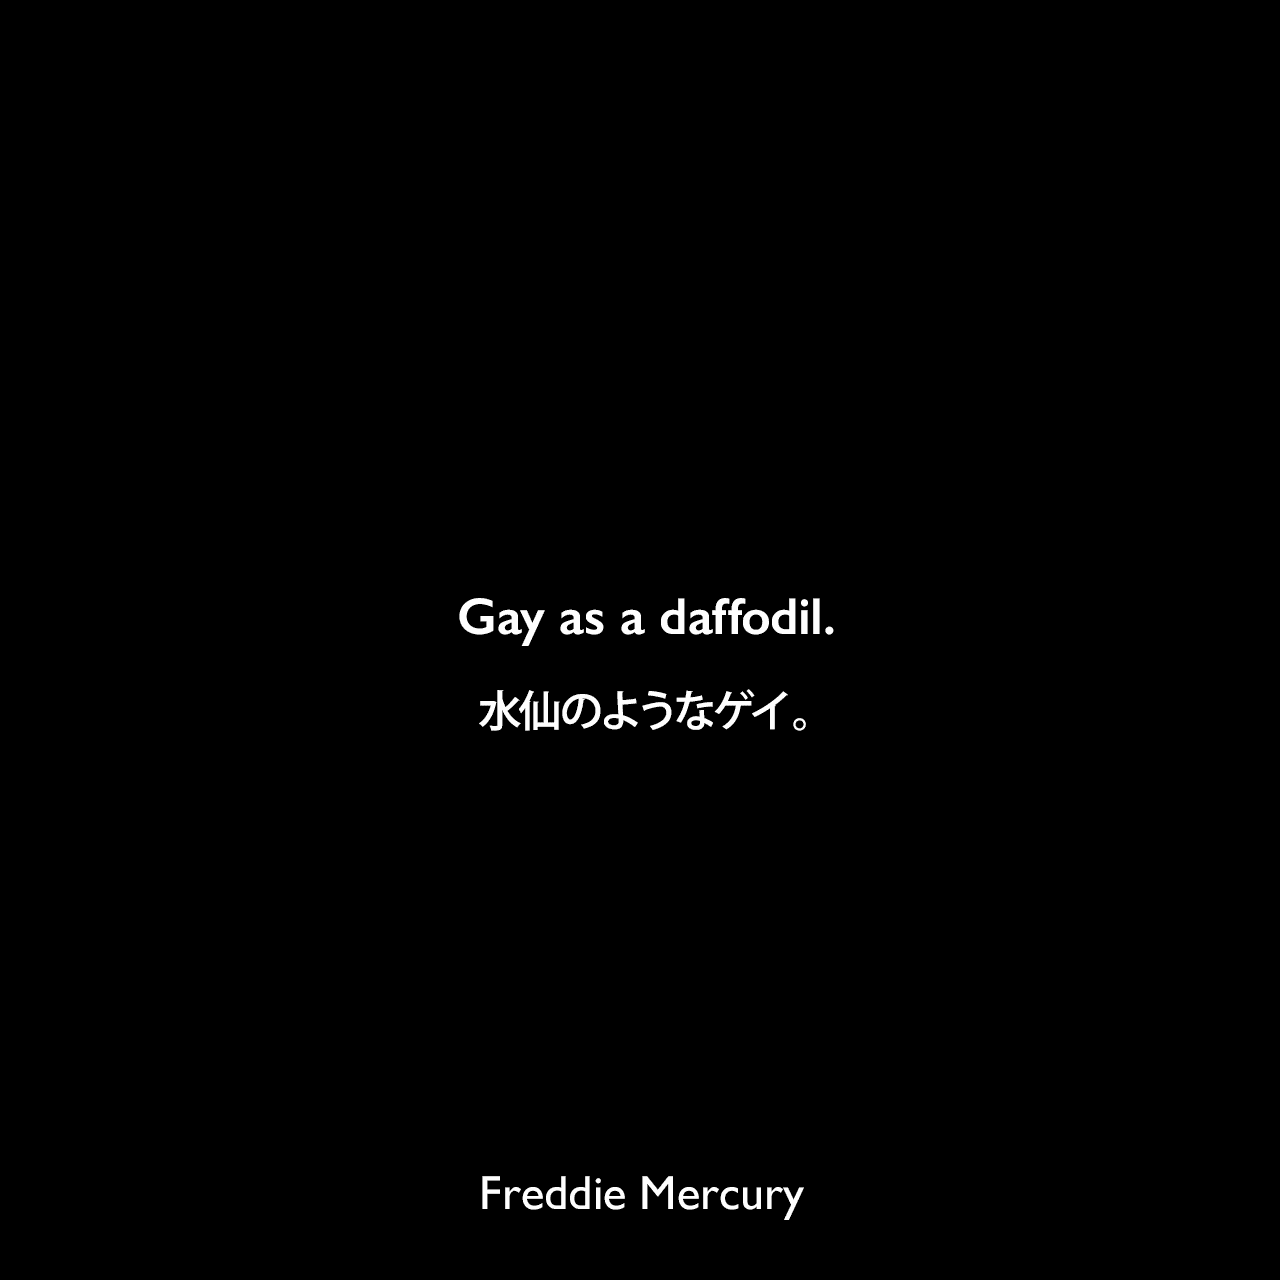 Gay as a daffodil.水仙のようなゲイ。- 1974年3月 雑誌「ニュー・ミュージカル・エクスプレス」のインタビューで自分自身についてFreddie Mercury